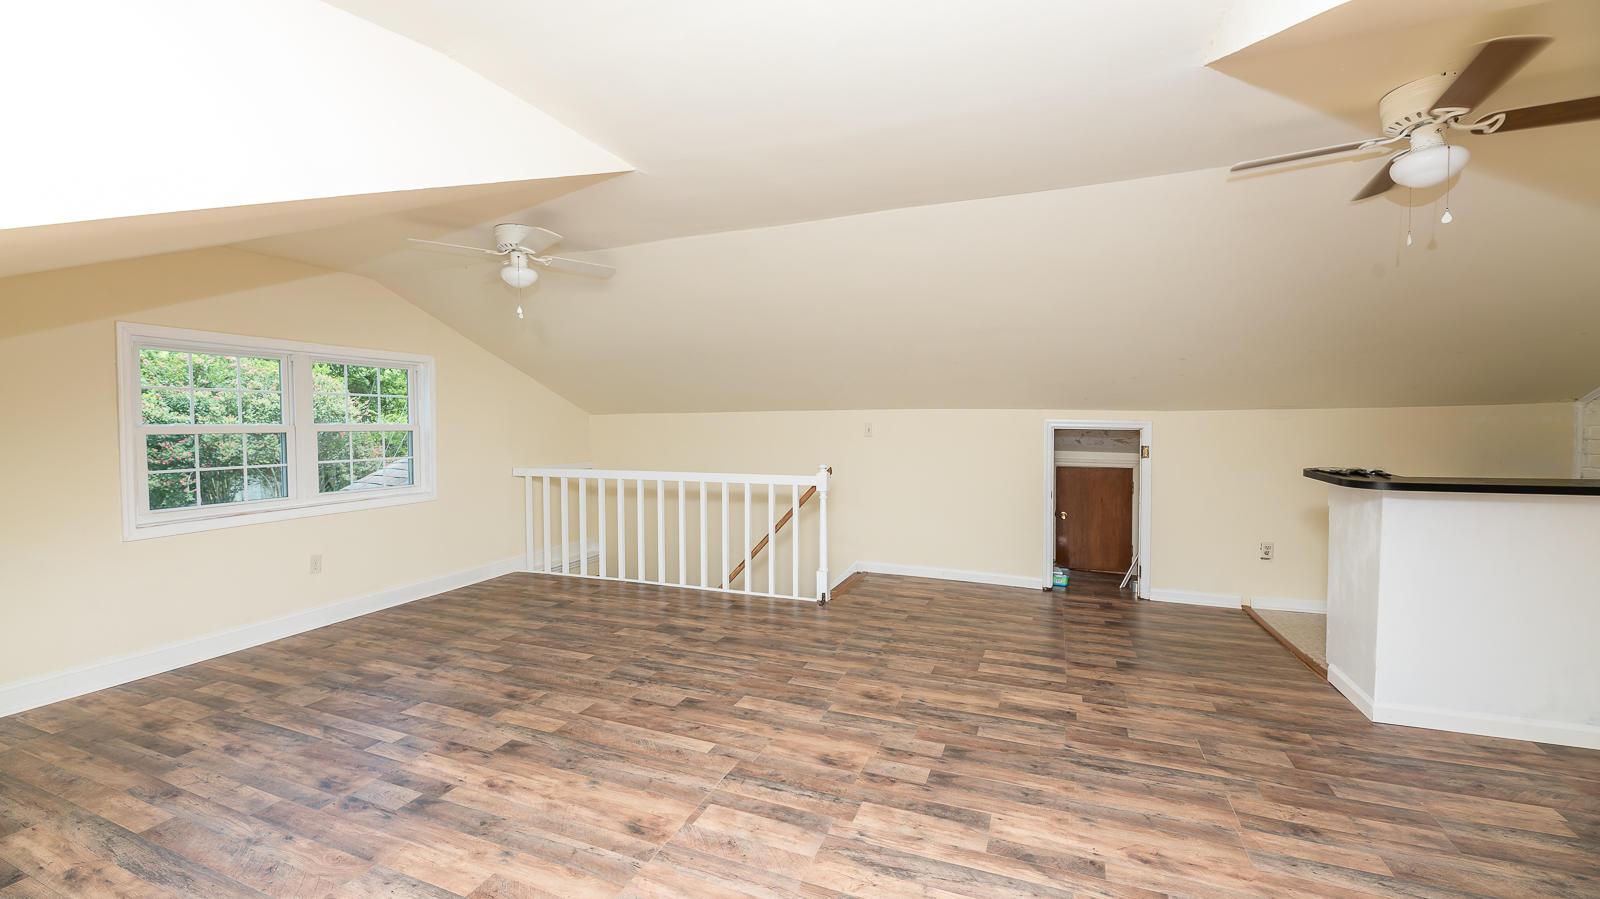 Ashley Villas Homes For Sale - 4315 Briarstone, North Charleston, SC - 4